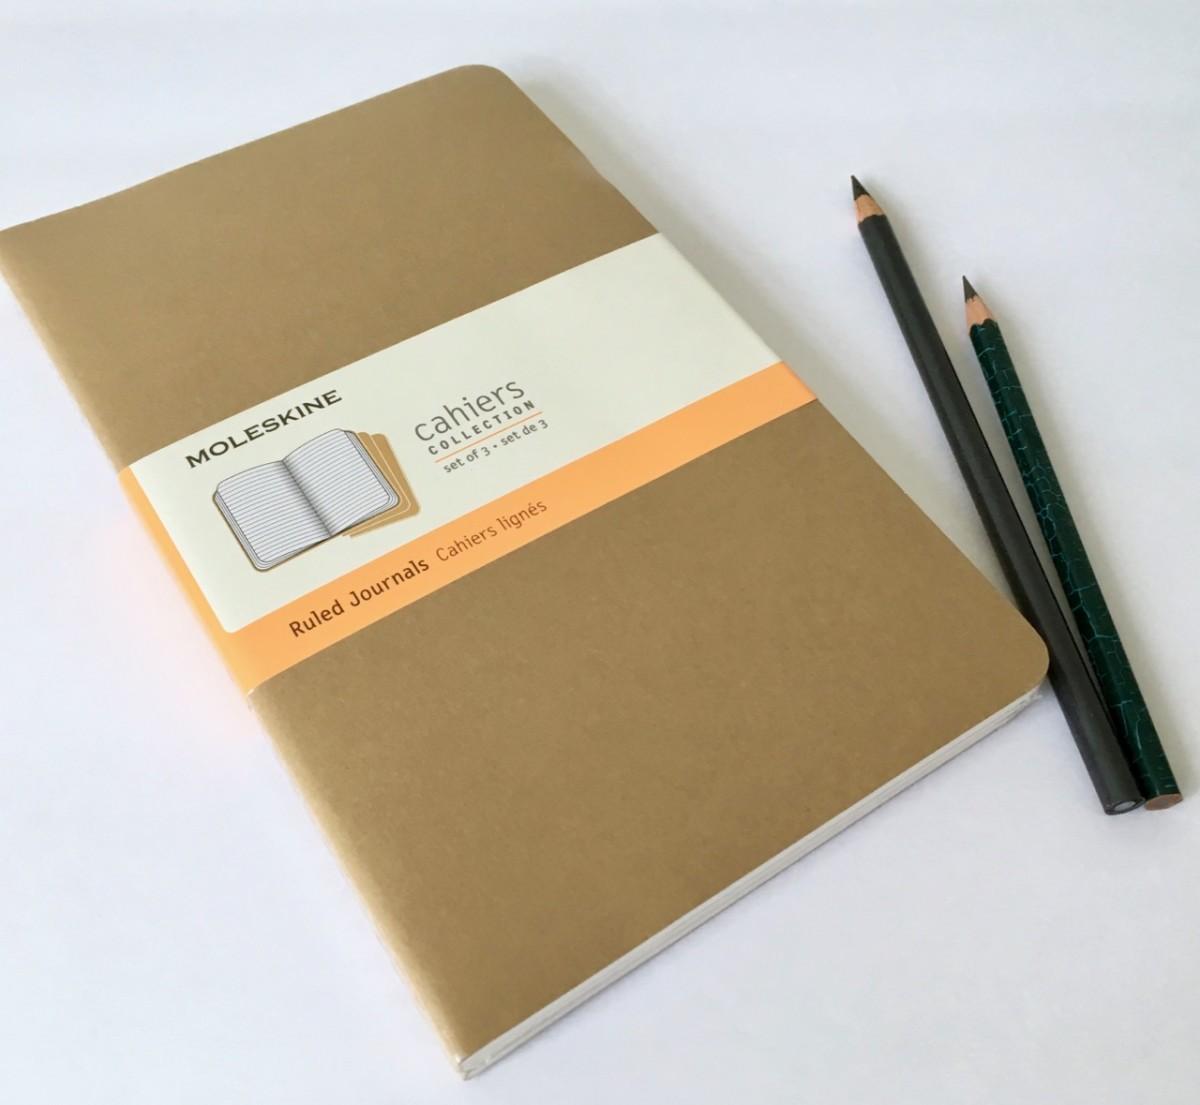 Moleskine Cahier Journal Set